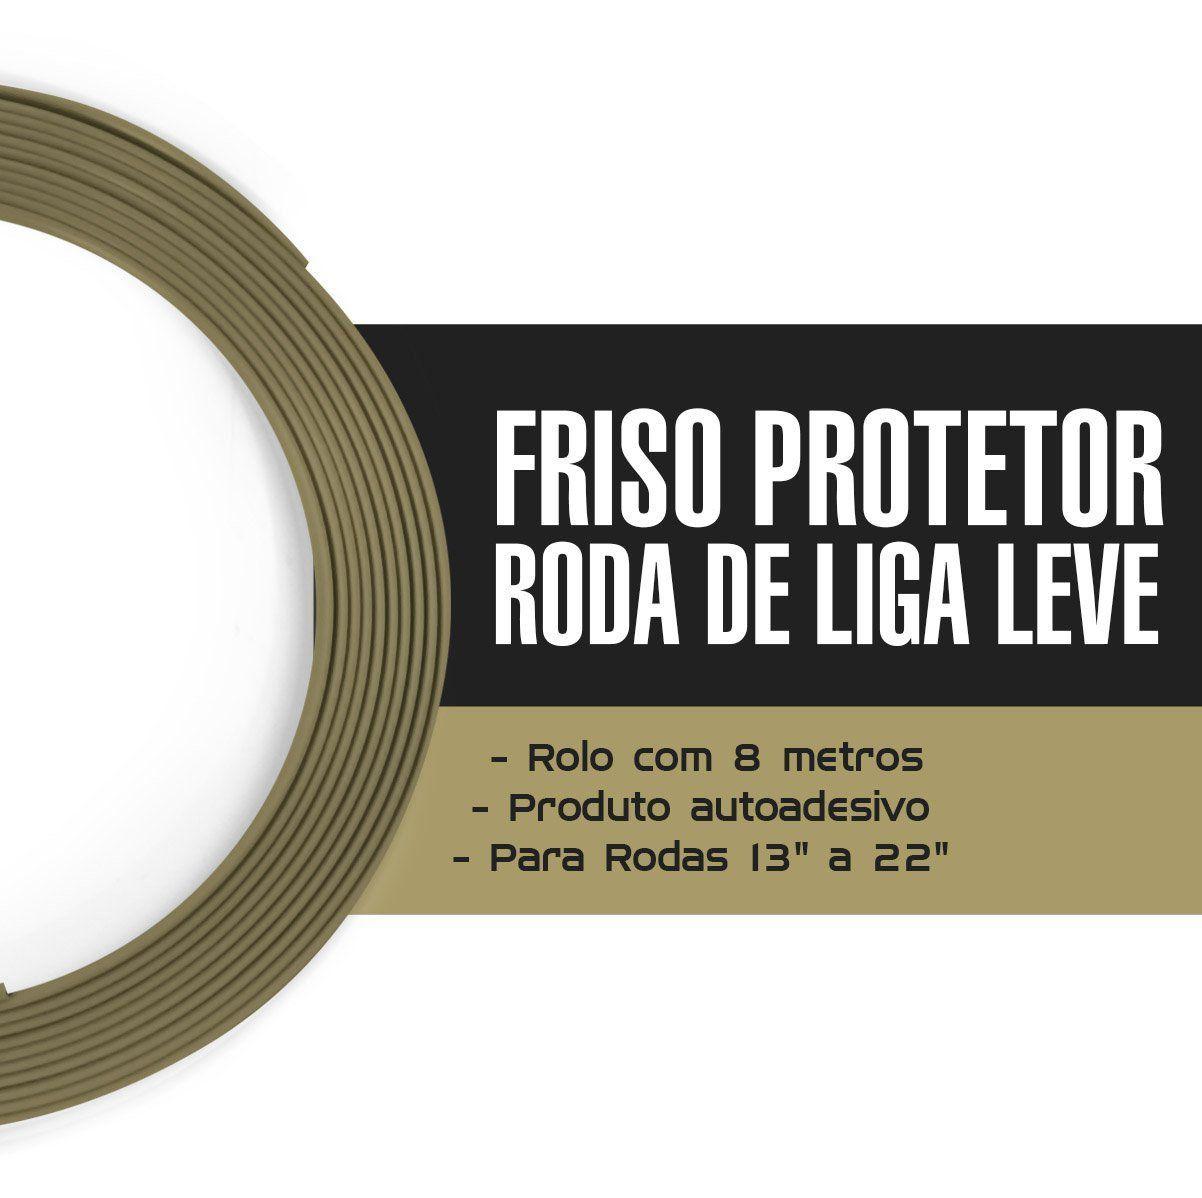 Friso Protetor Roda Liga Leve Esportiva Tuning 8m - Bronze